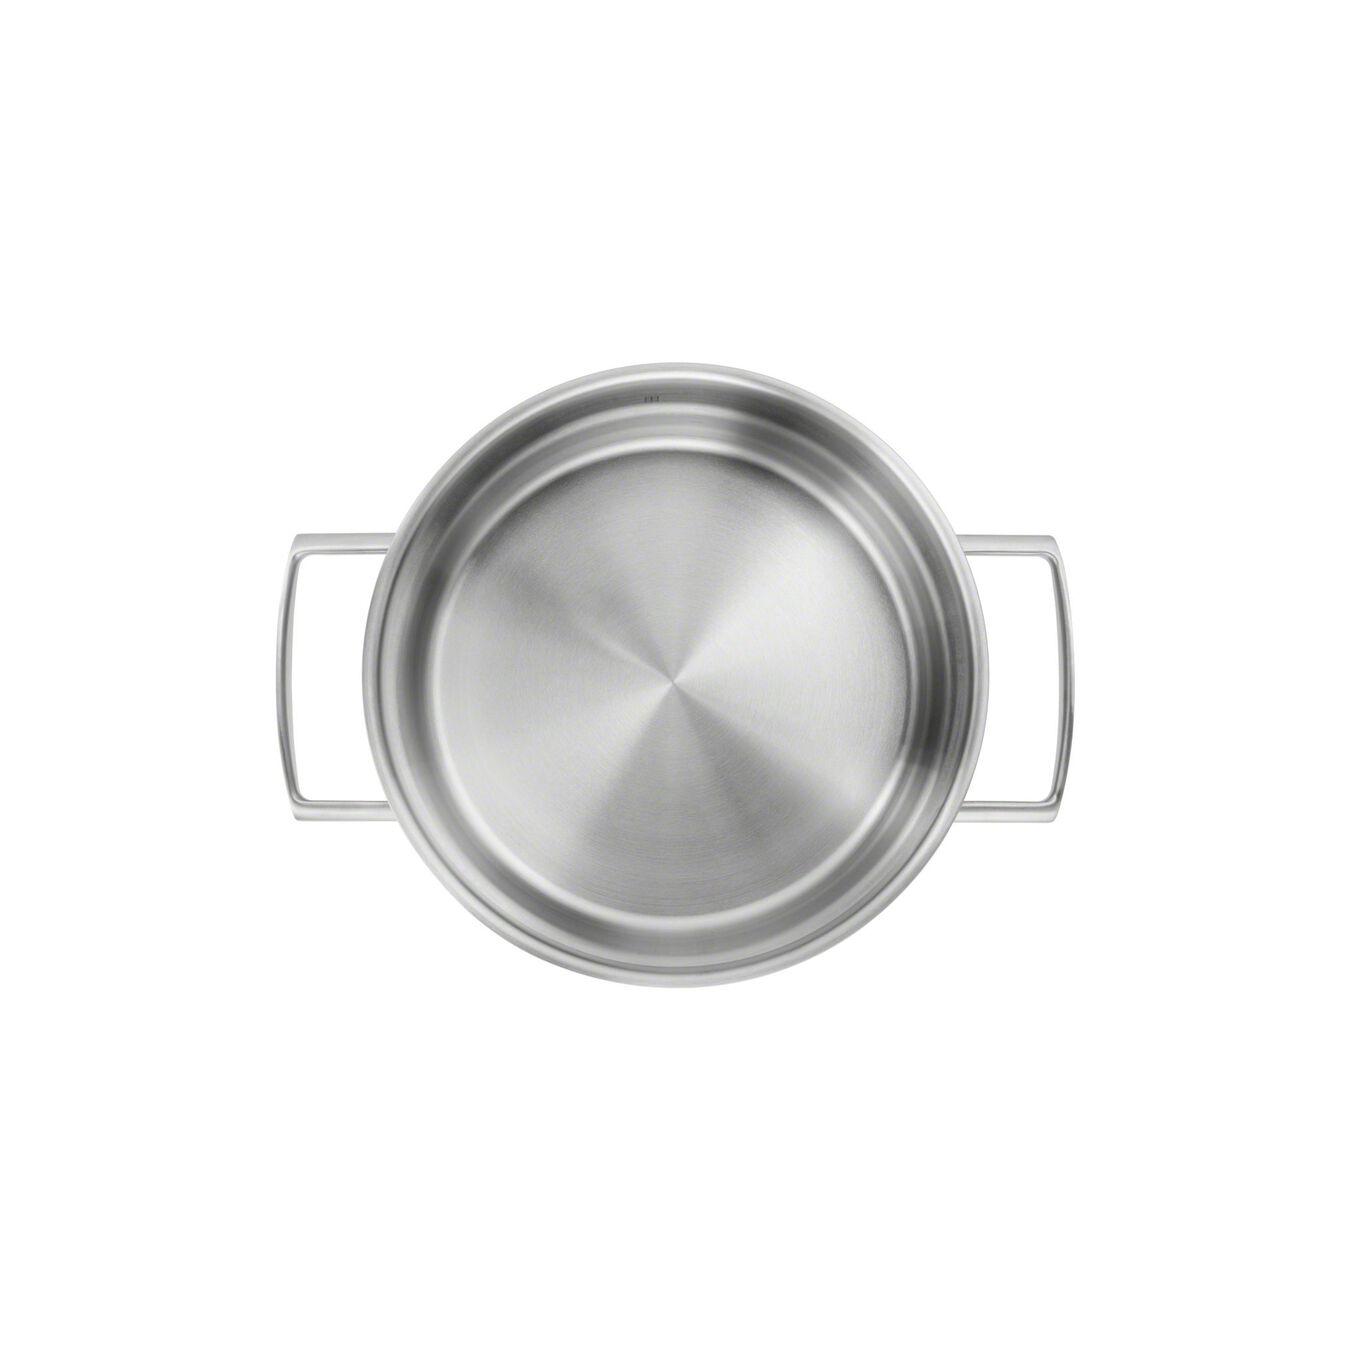 Tencere Seti | 18/10 Paslanmaz Çelik | 5-parça,,large 10